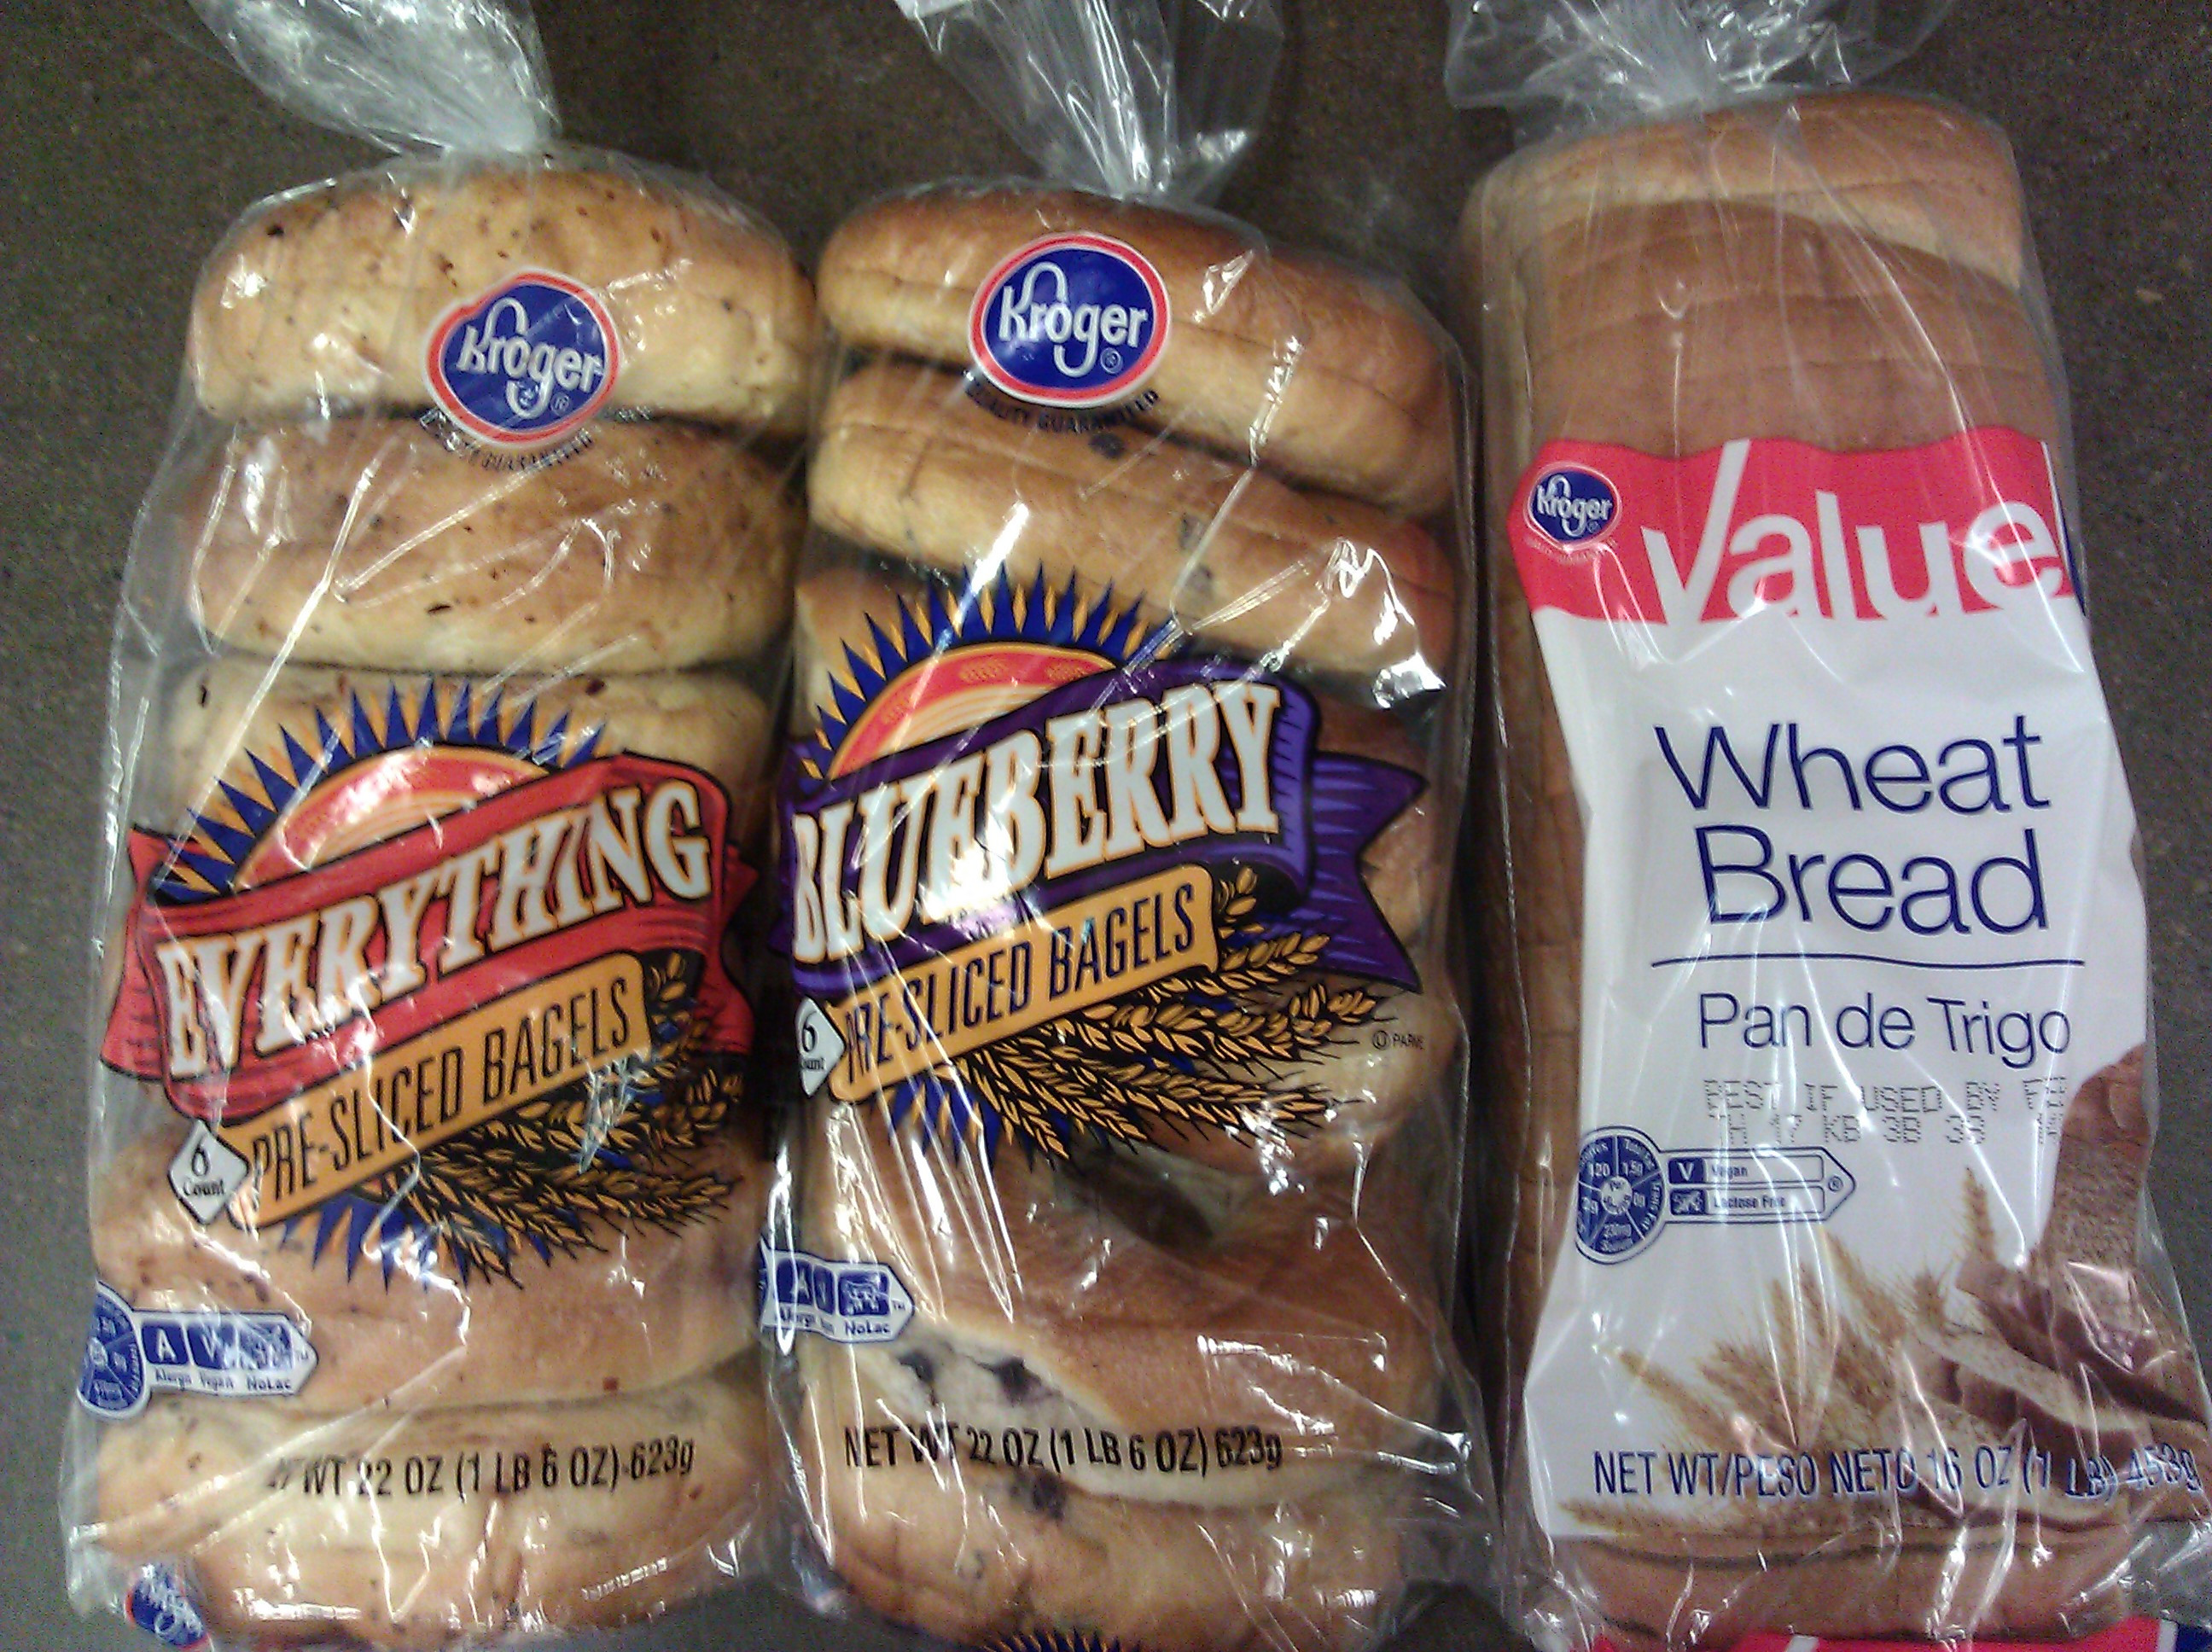 Vegan Bread Brands  Vegans aren't Whole Foods whores